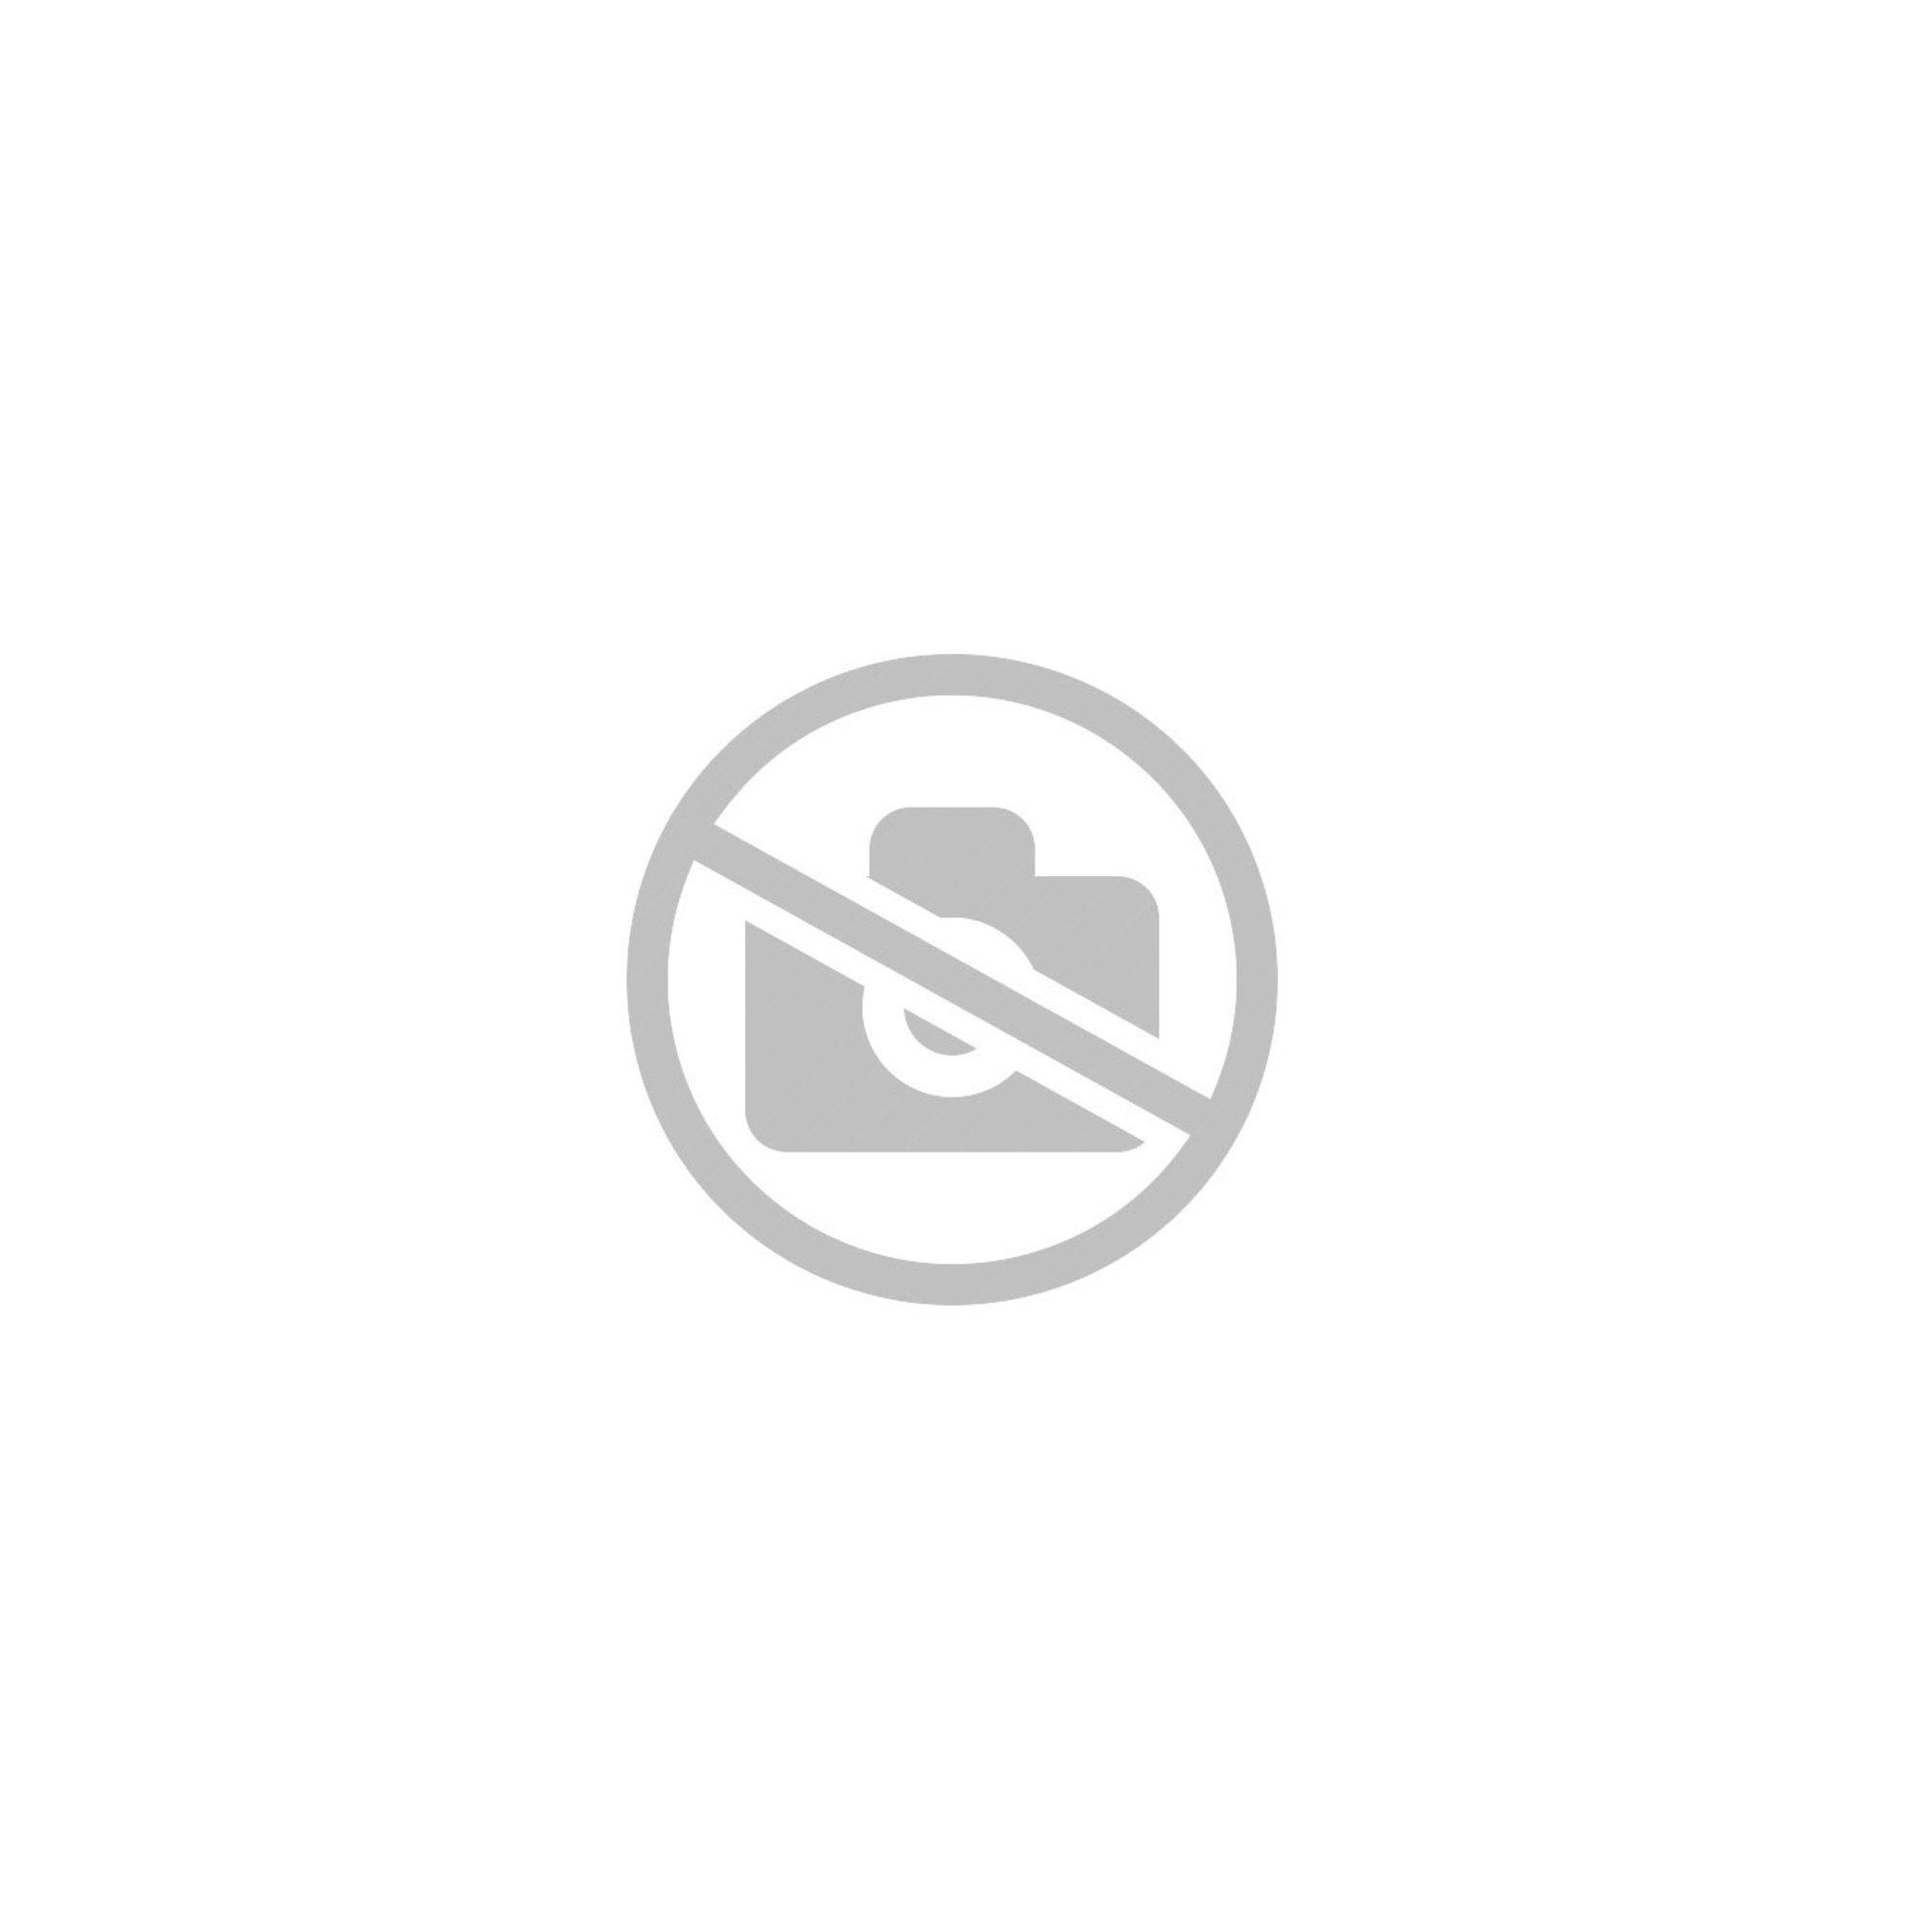 Landmann Ugas regulator med slang